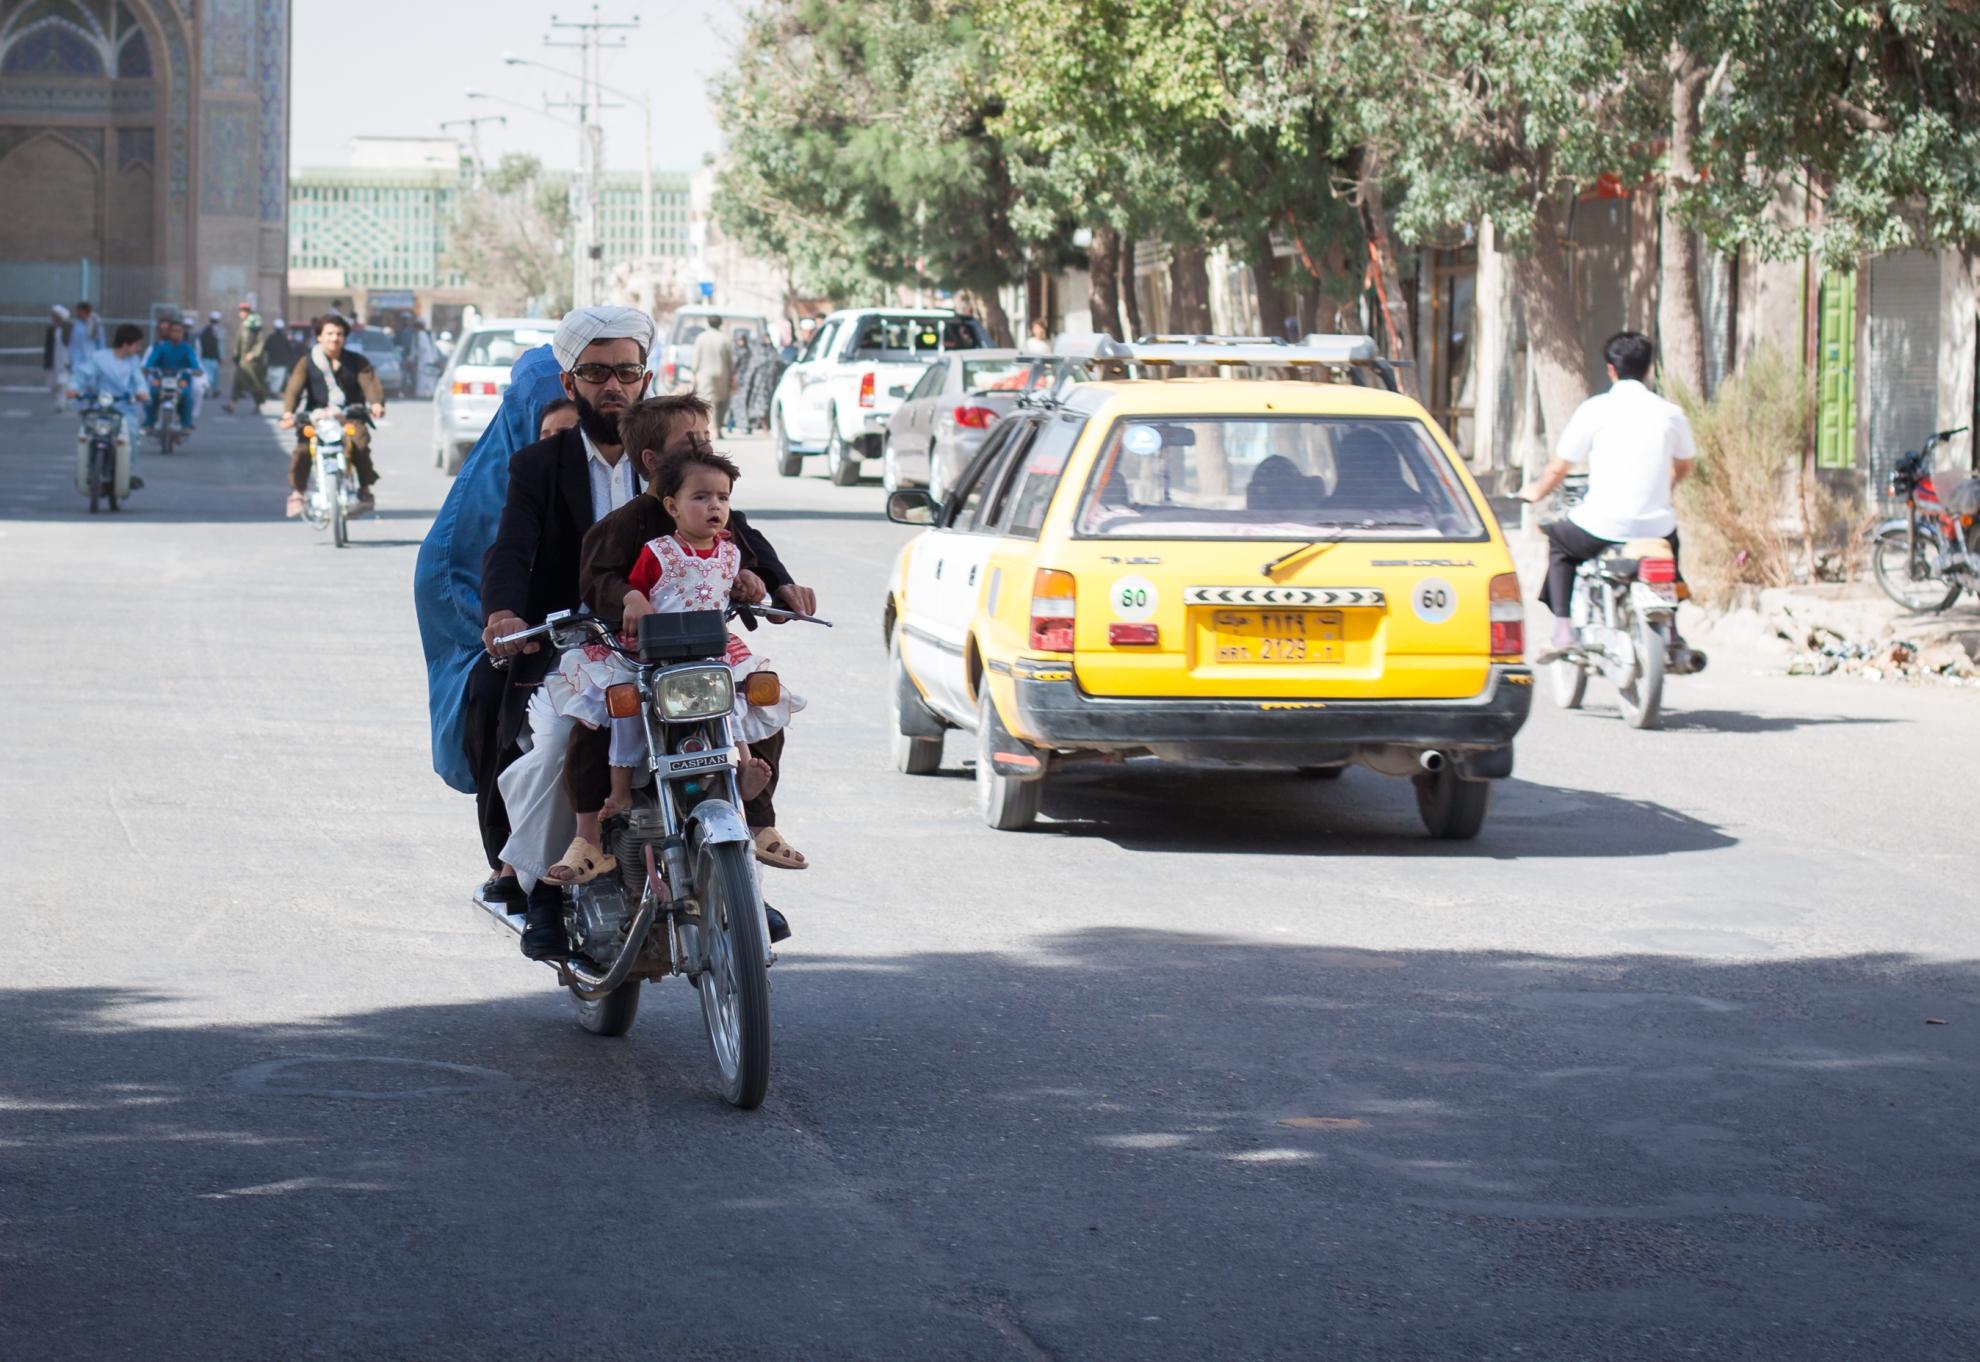 Street scene in Kabul. Photo: Danish Refugee Council/Erick Gerstner